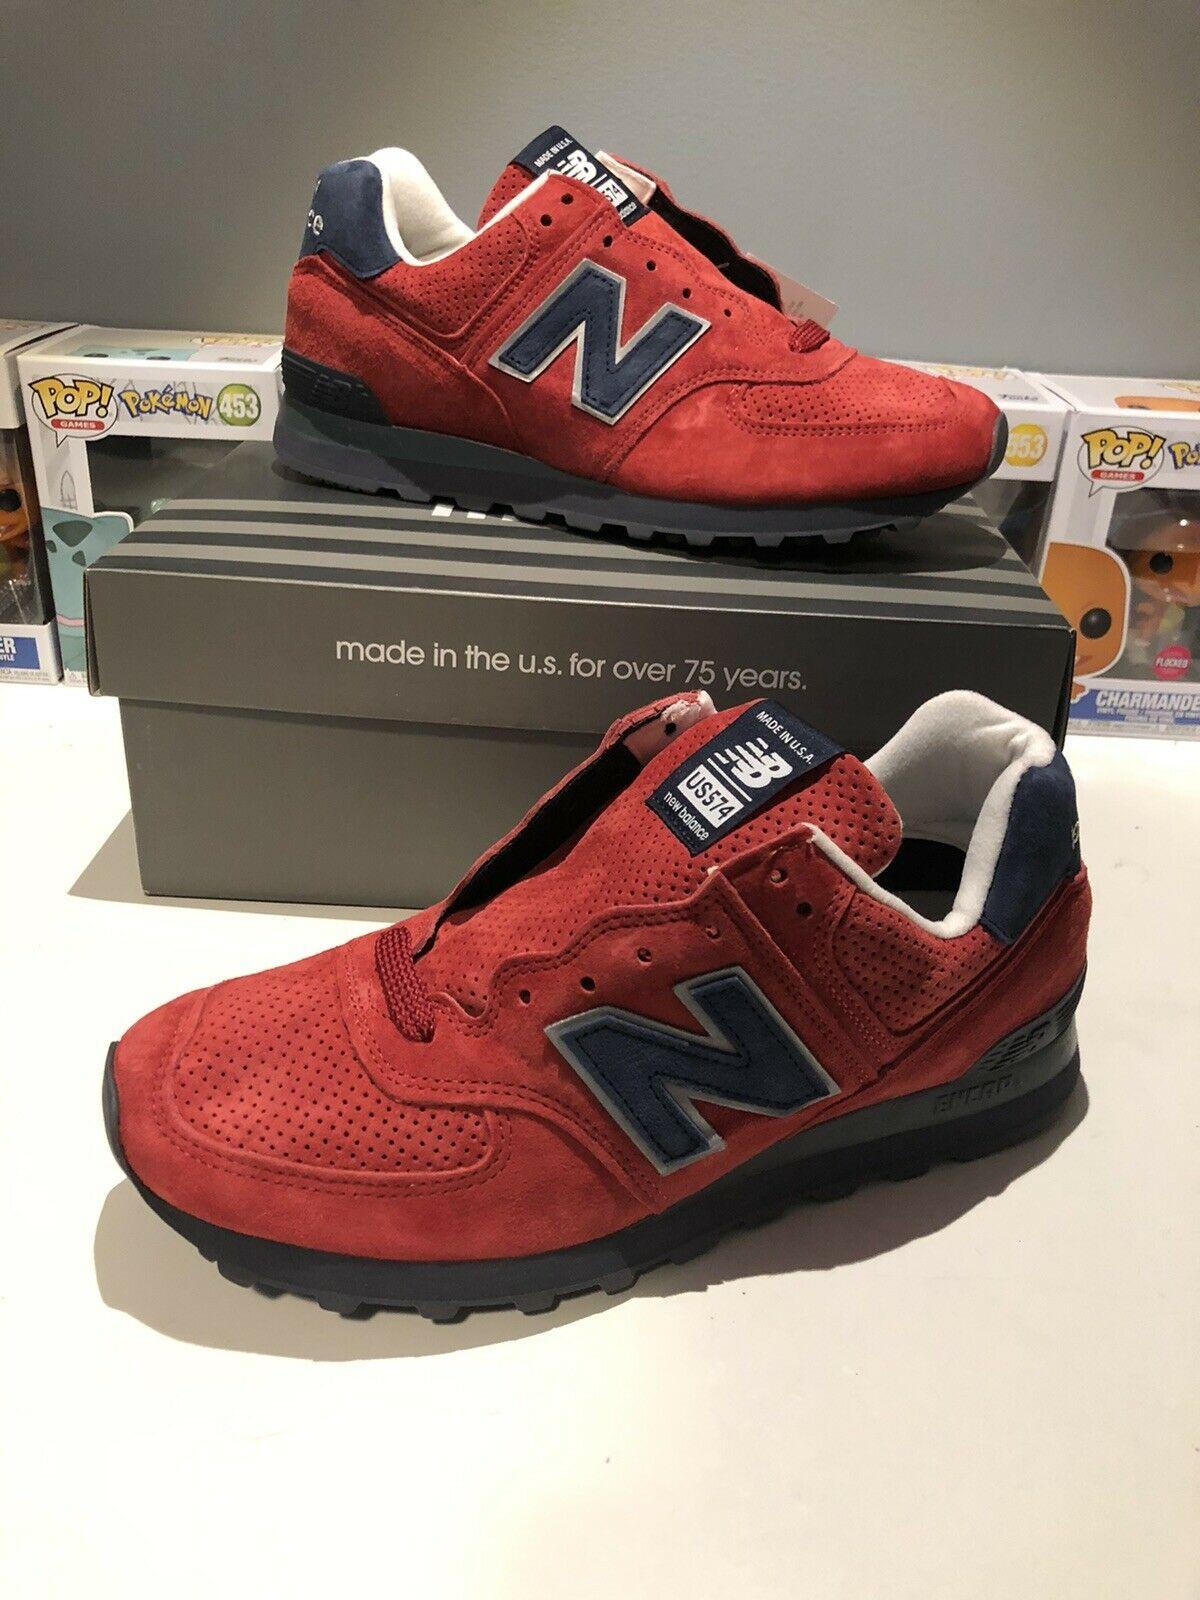 New Balance 597 Red